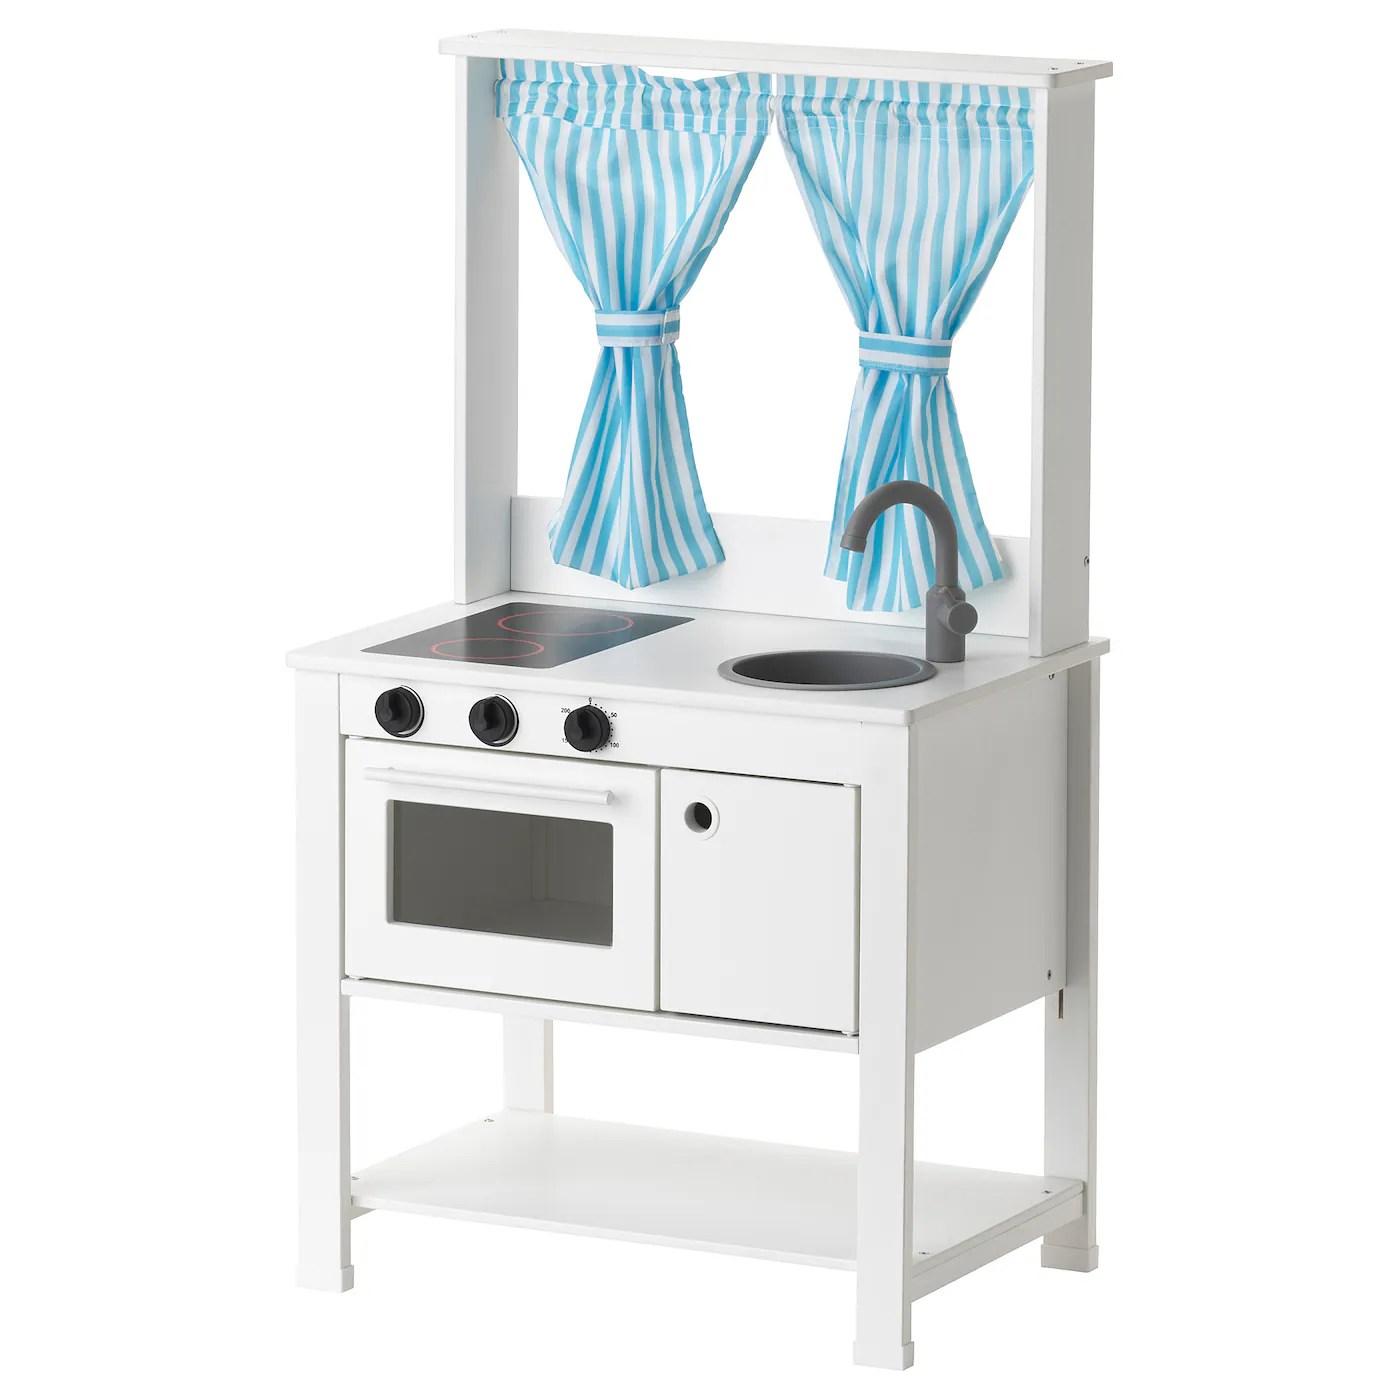 spisig mini cuisine avec rideaux 55x37x98 cm